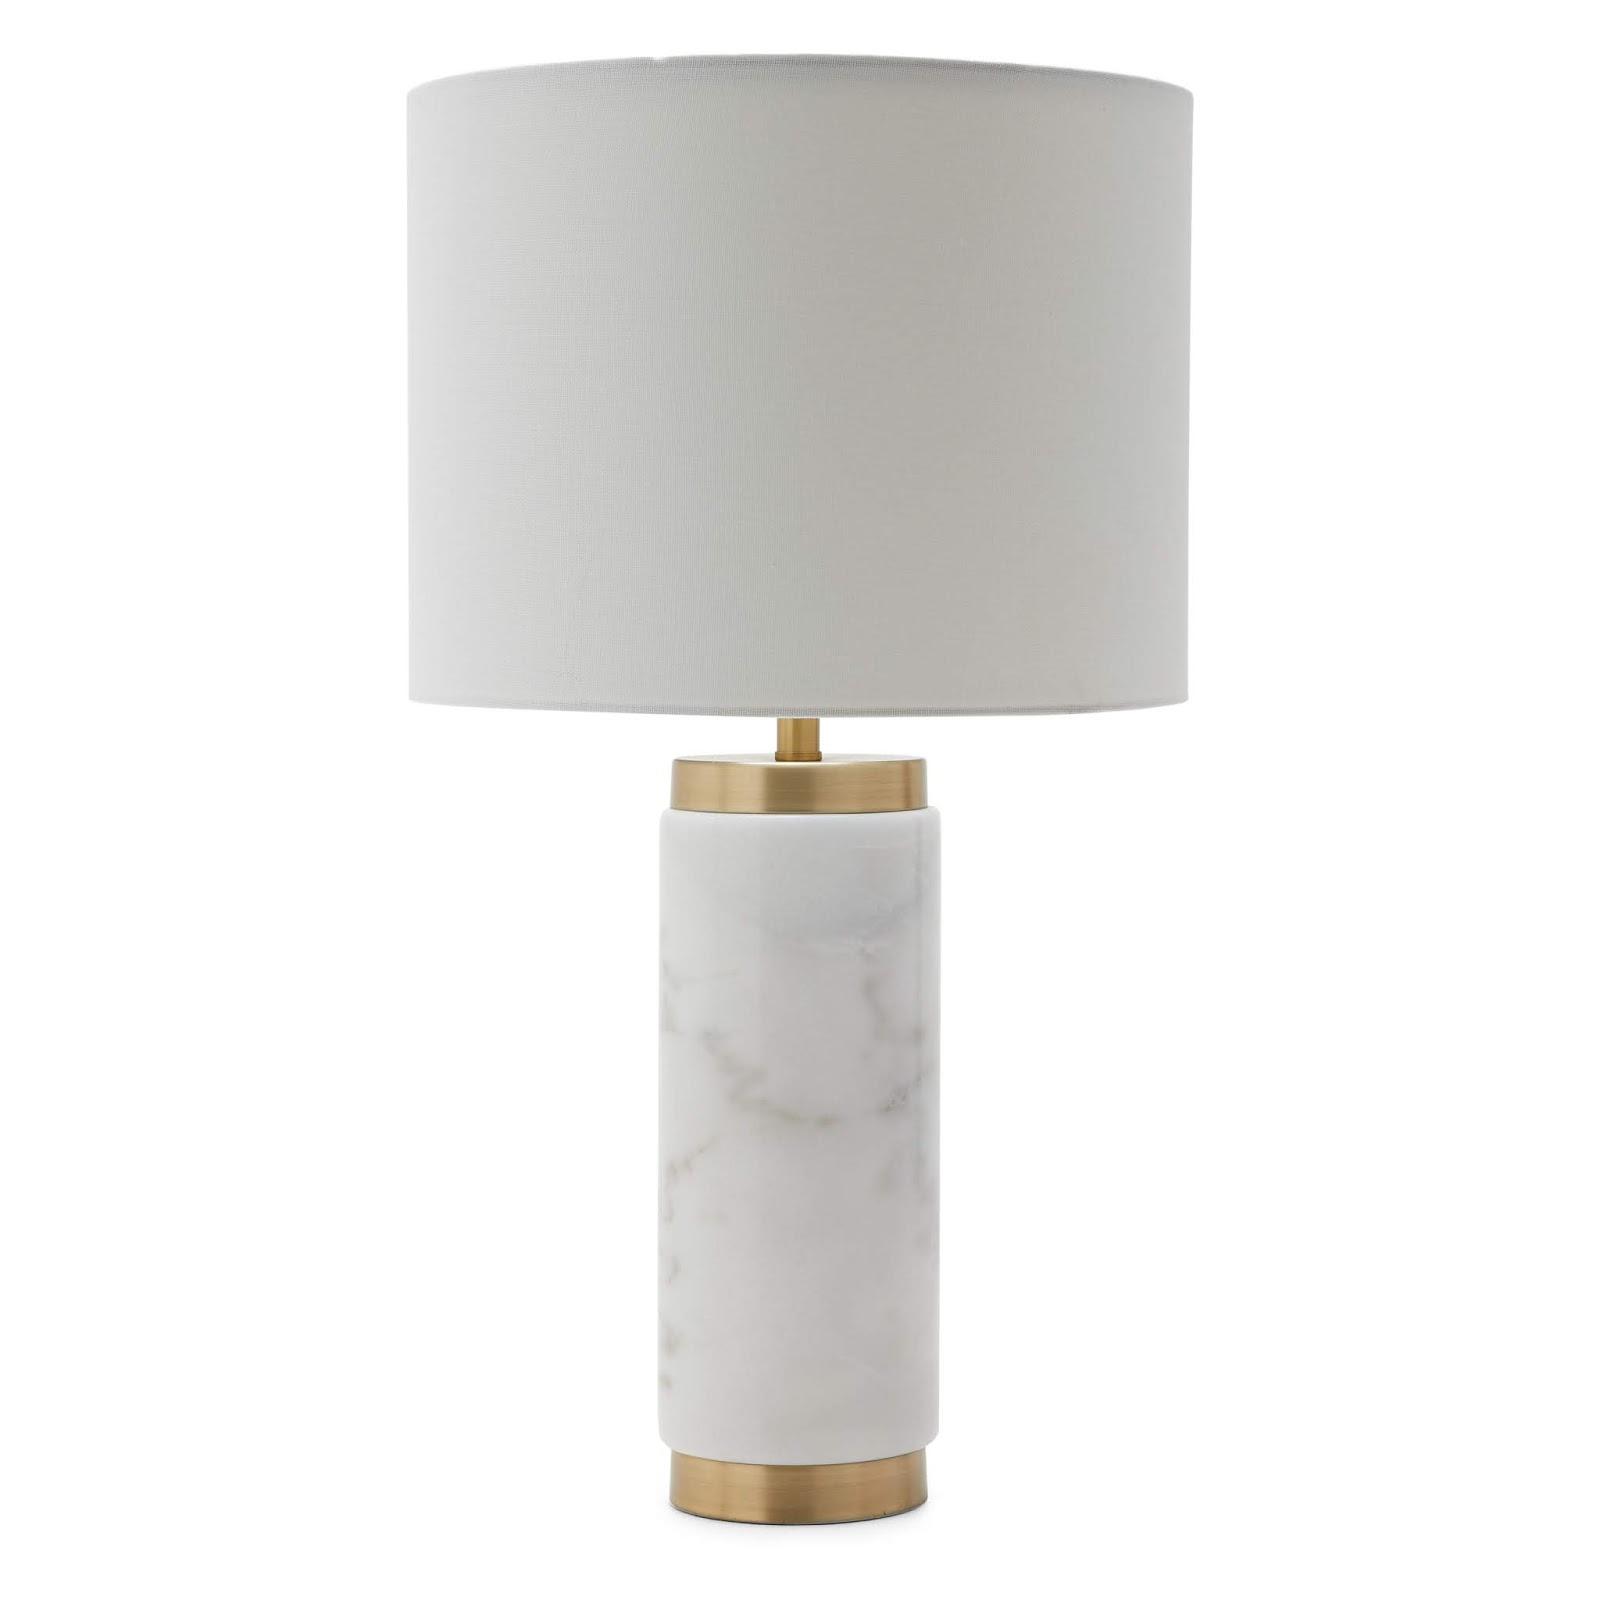 Modern marble lamp from Walmart